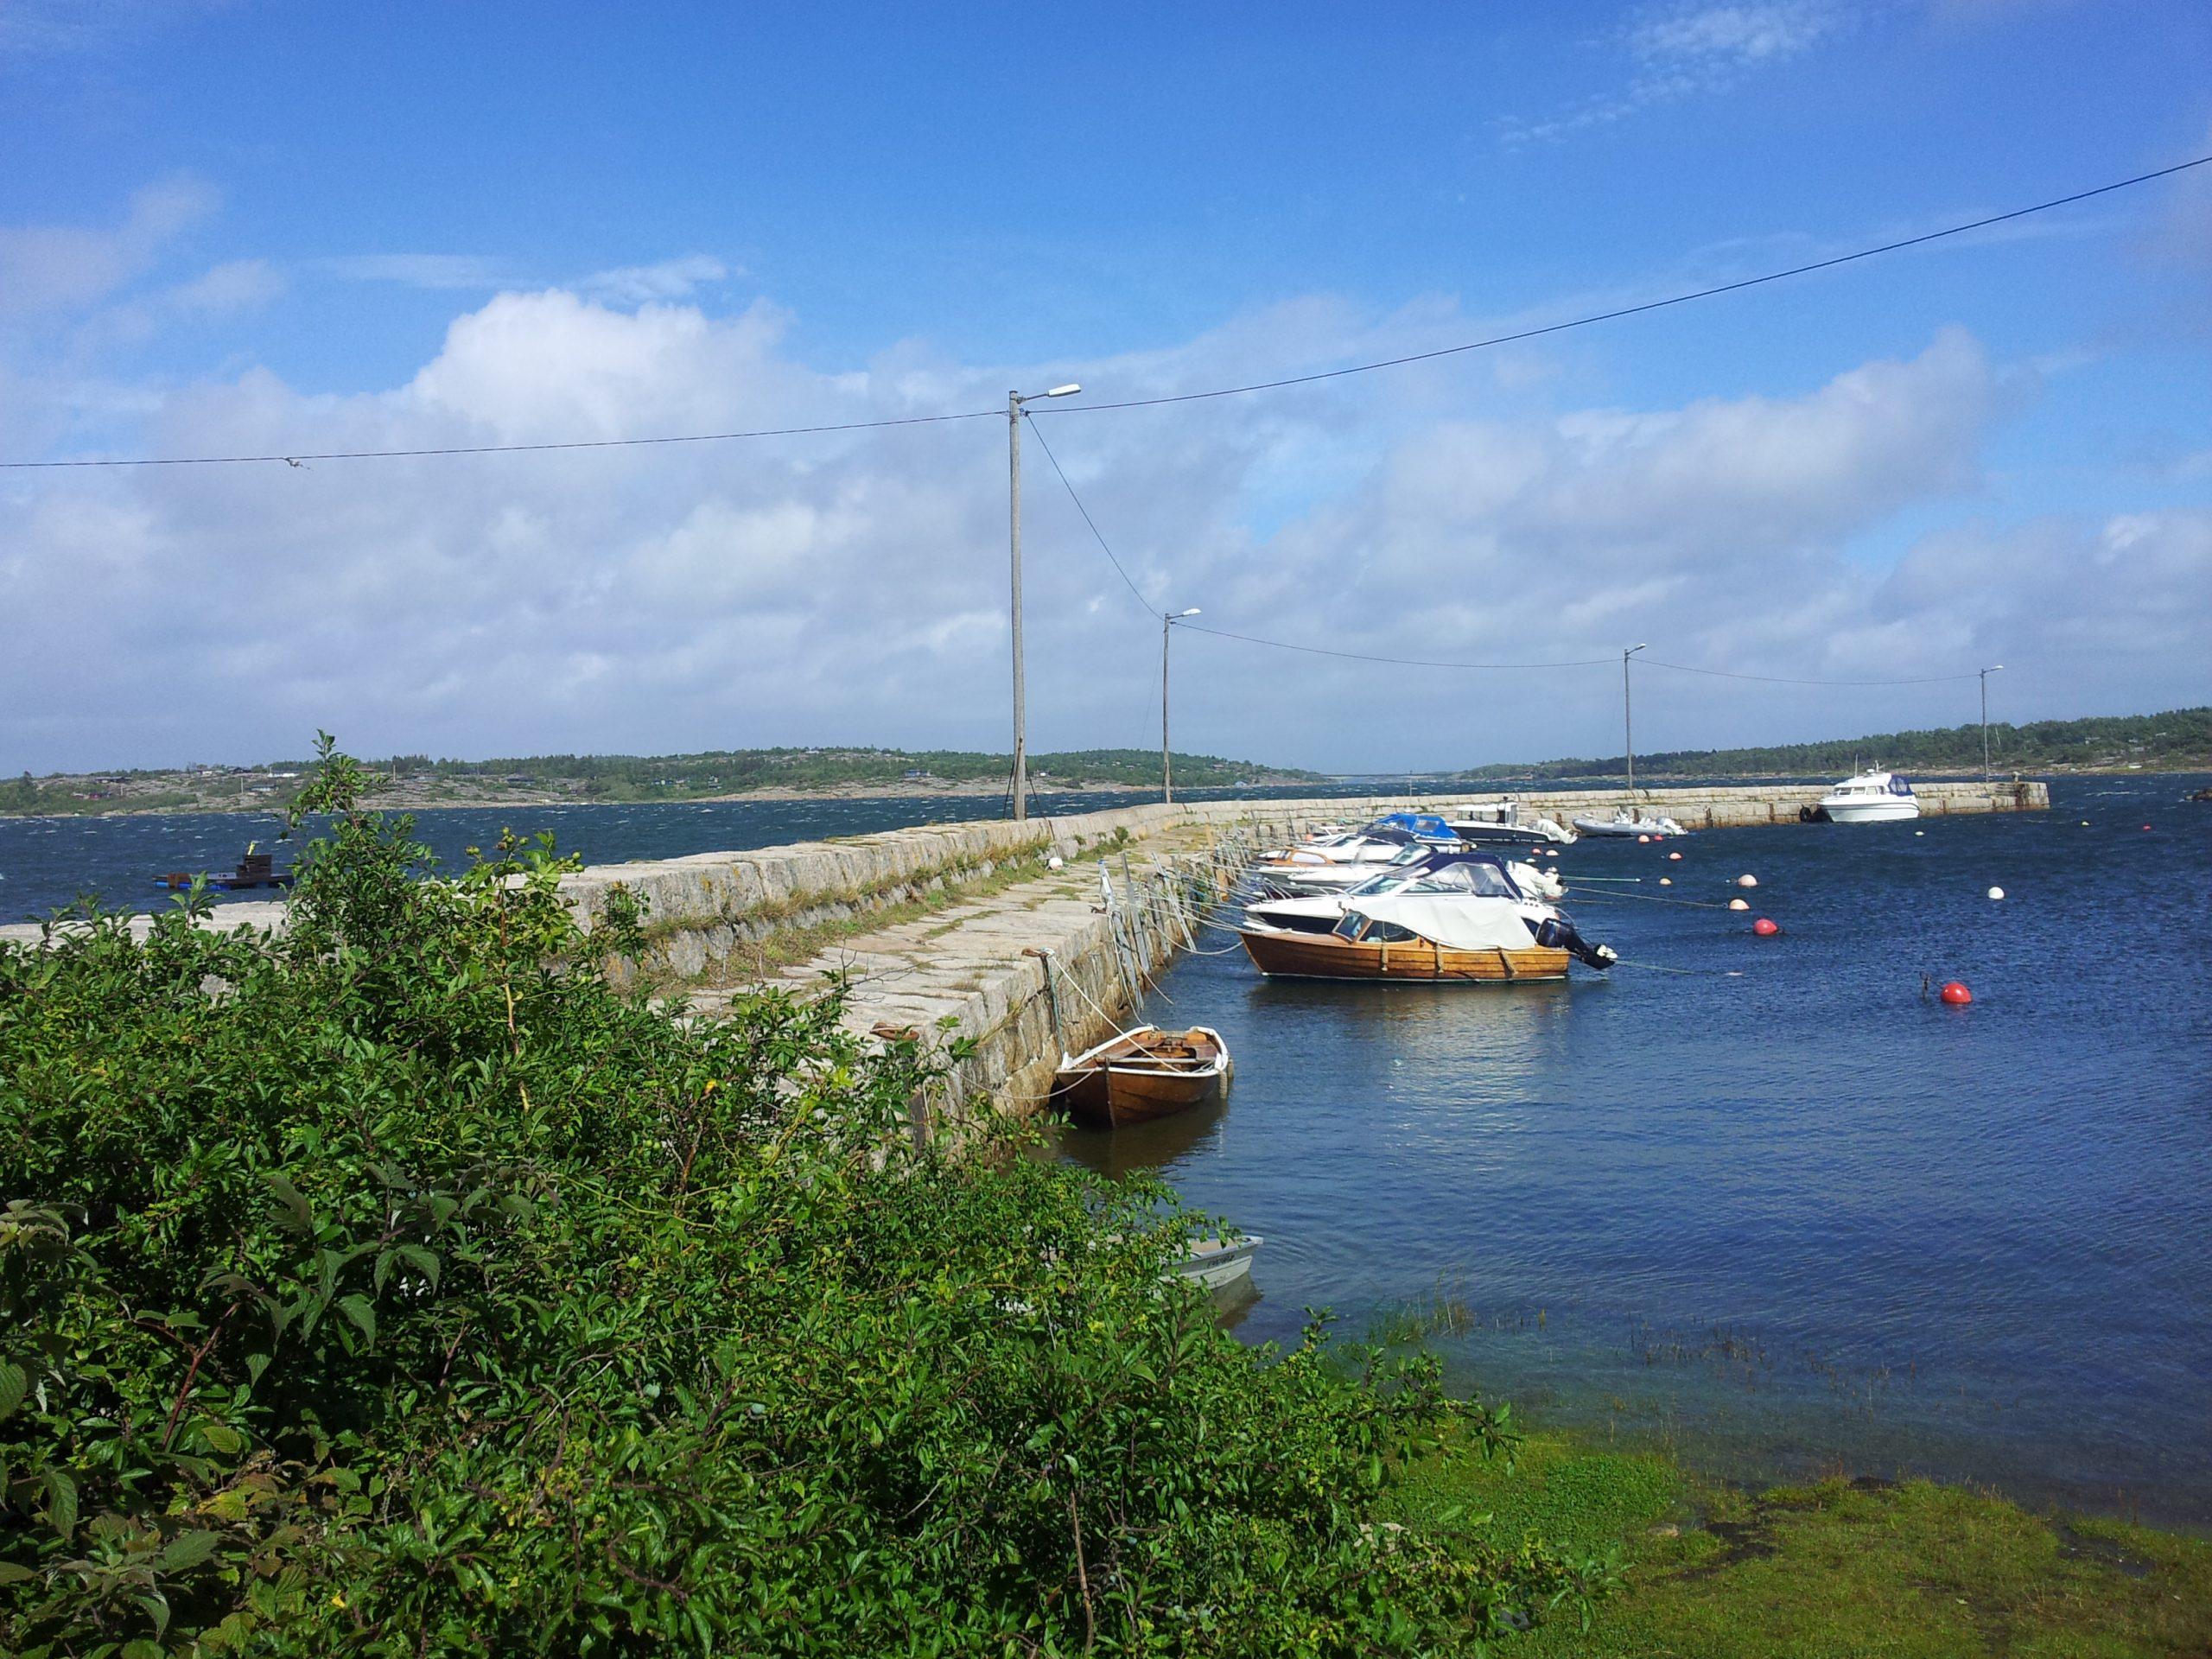 Bildet viser Kystverket Brattestø Fiskerihavn. Foto: Ingrid Djupedal, Riksantikvaren